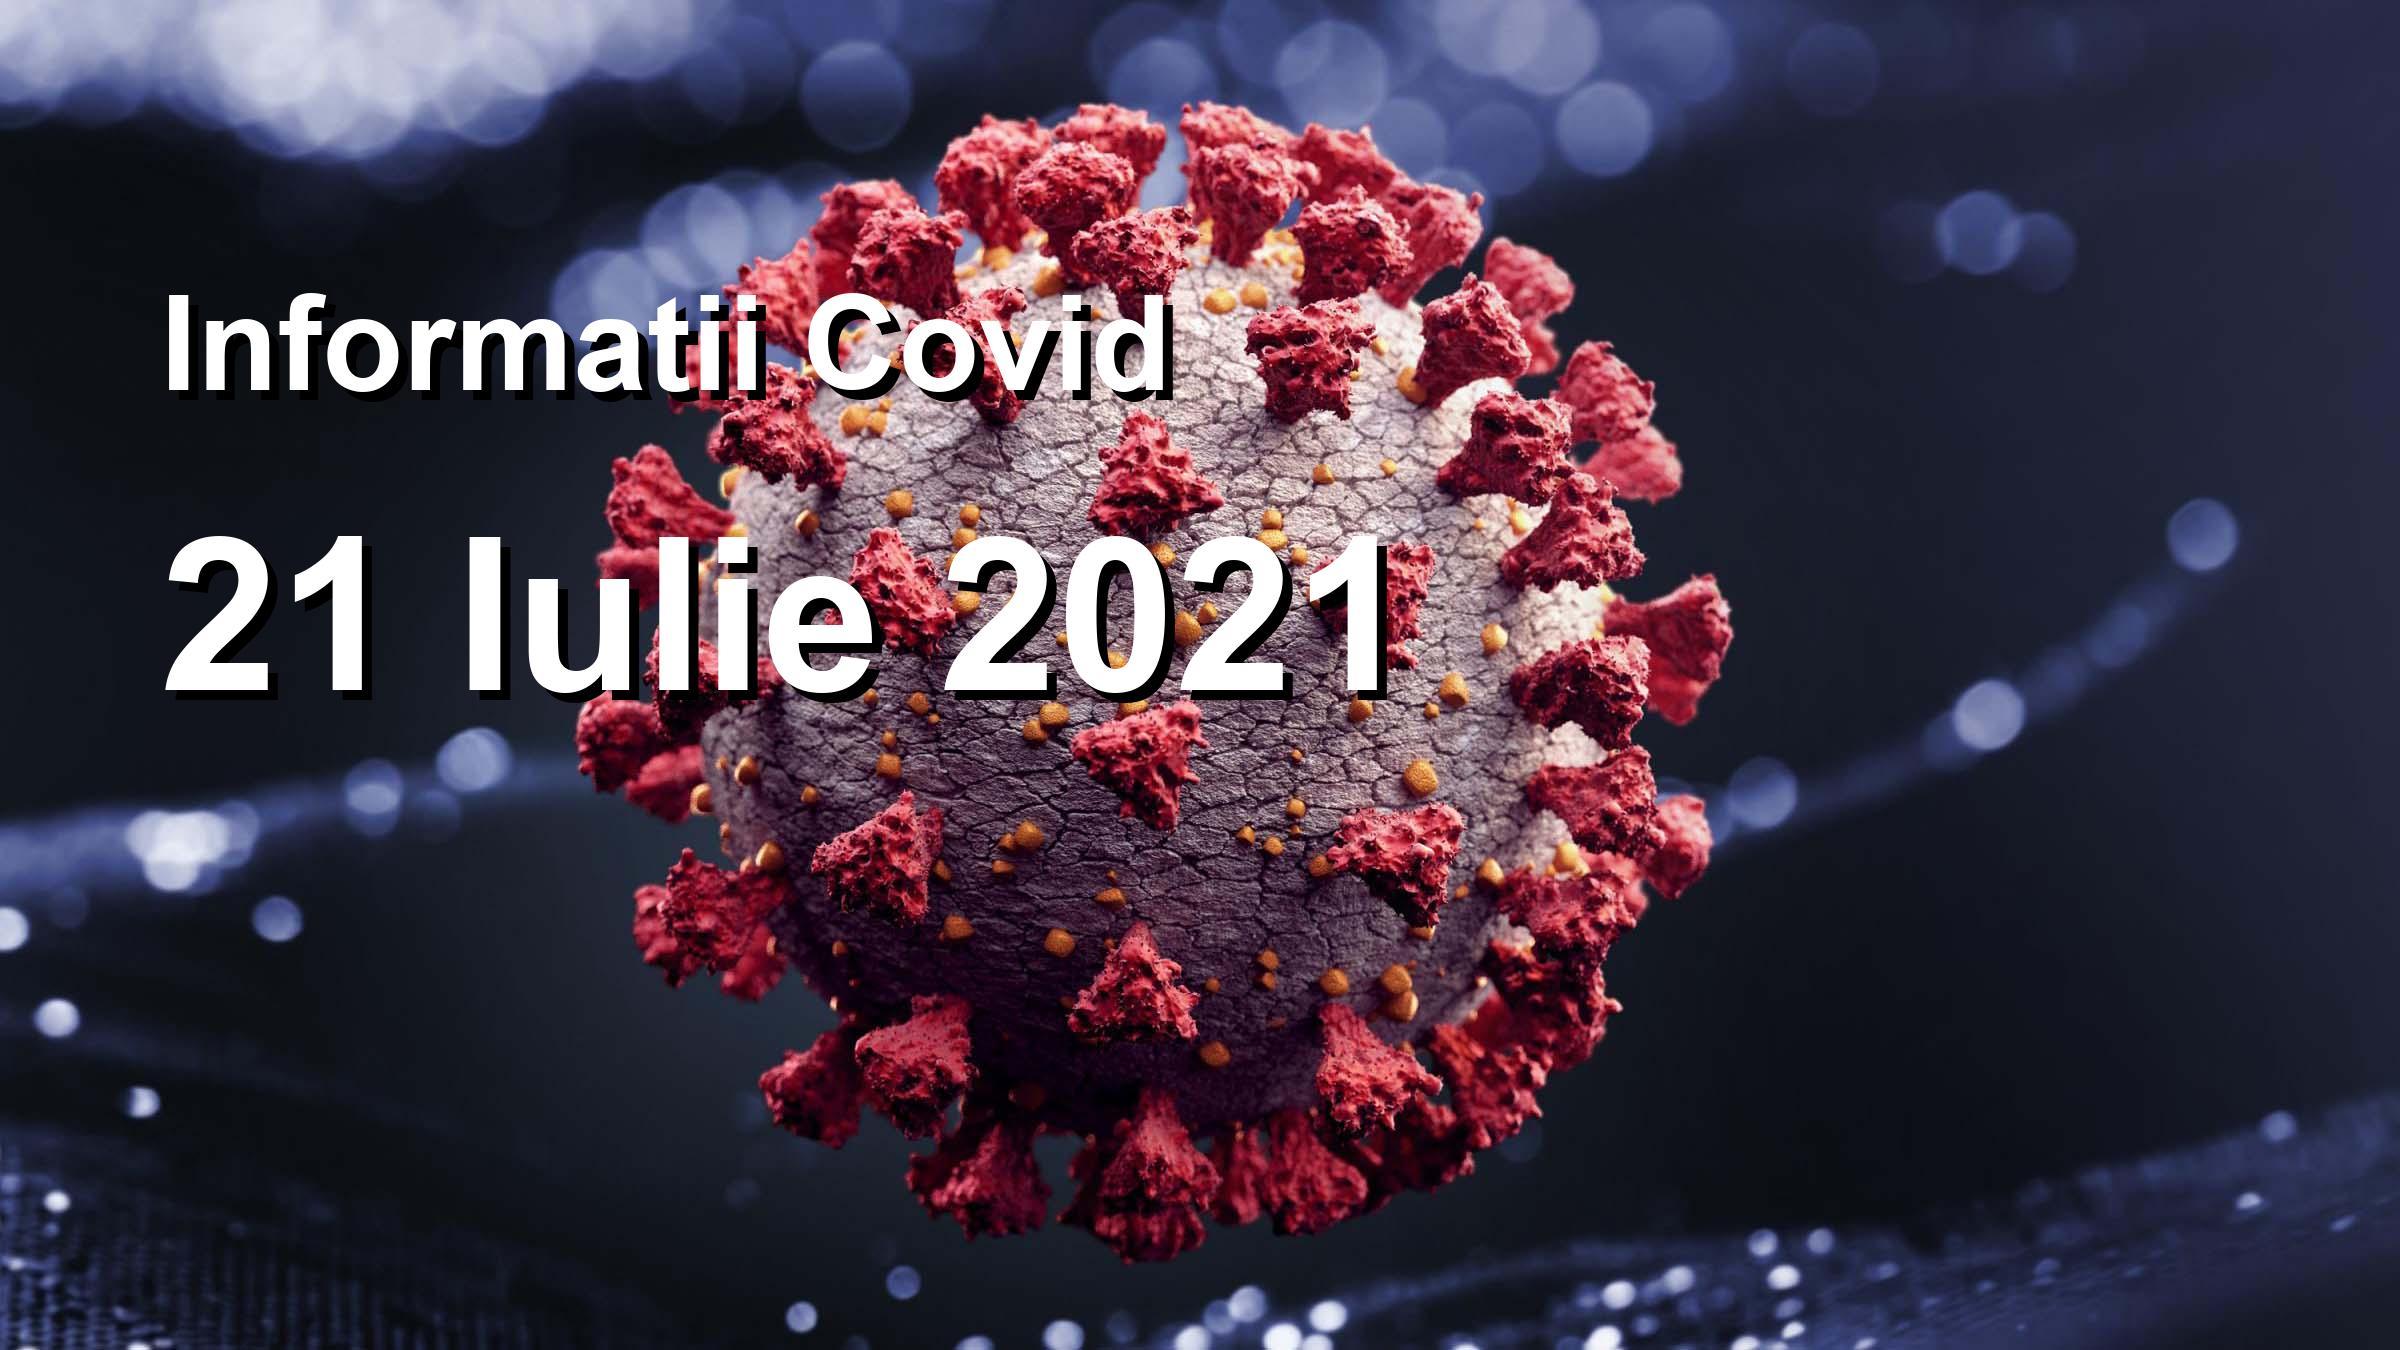 Informatii Covid-19 pentru 21 Iulie 2021: 102 infectari, 27164 teste. | Coronavirus Romania